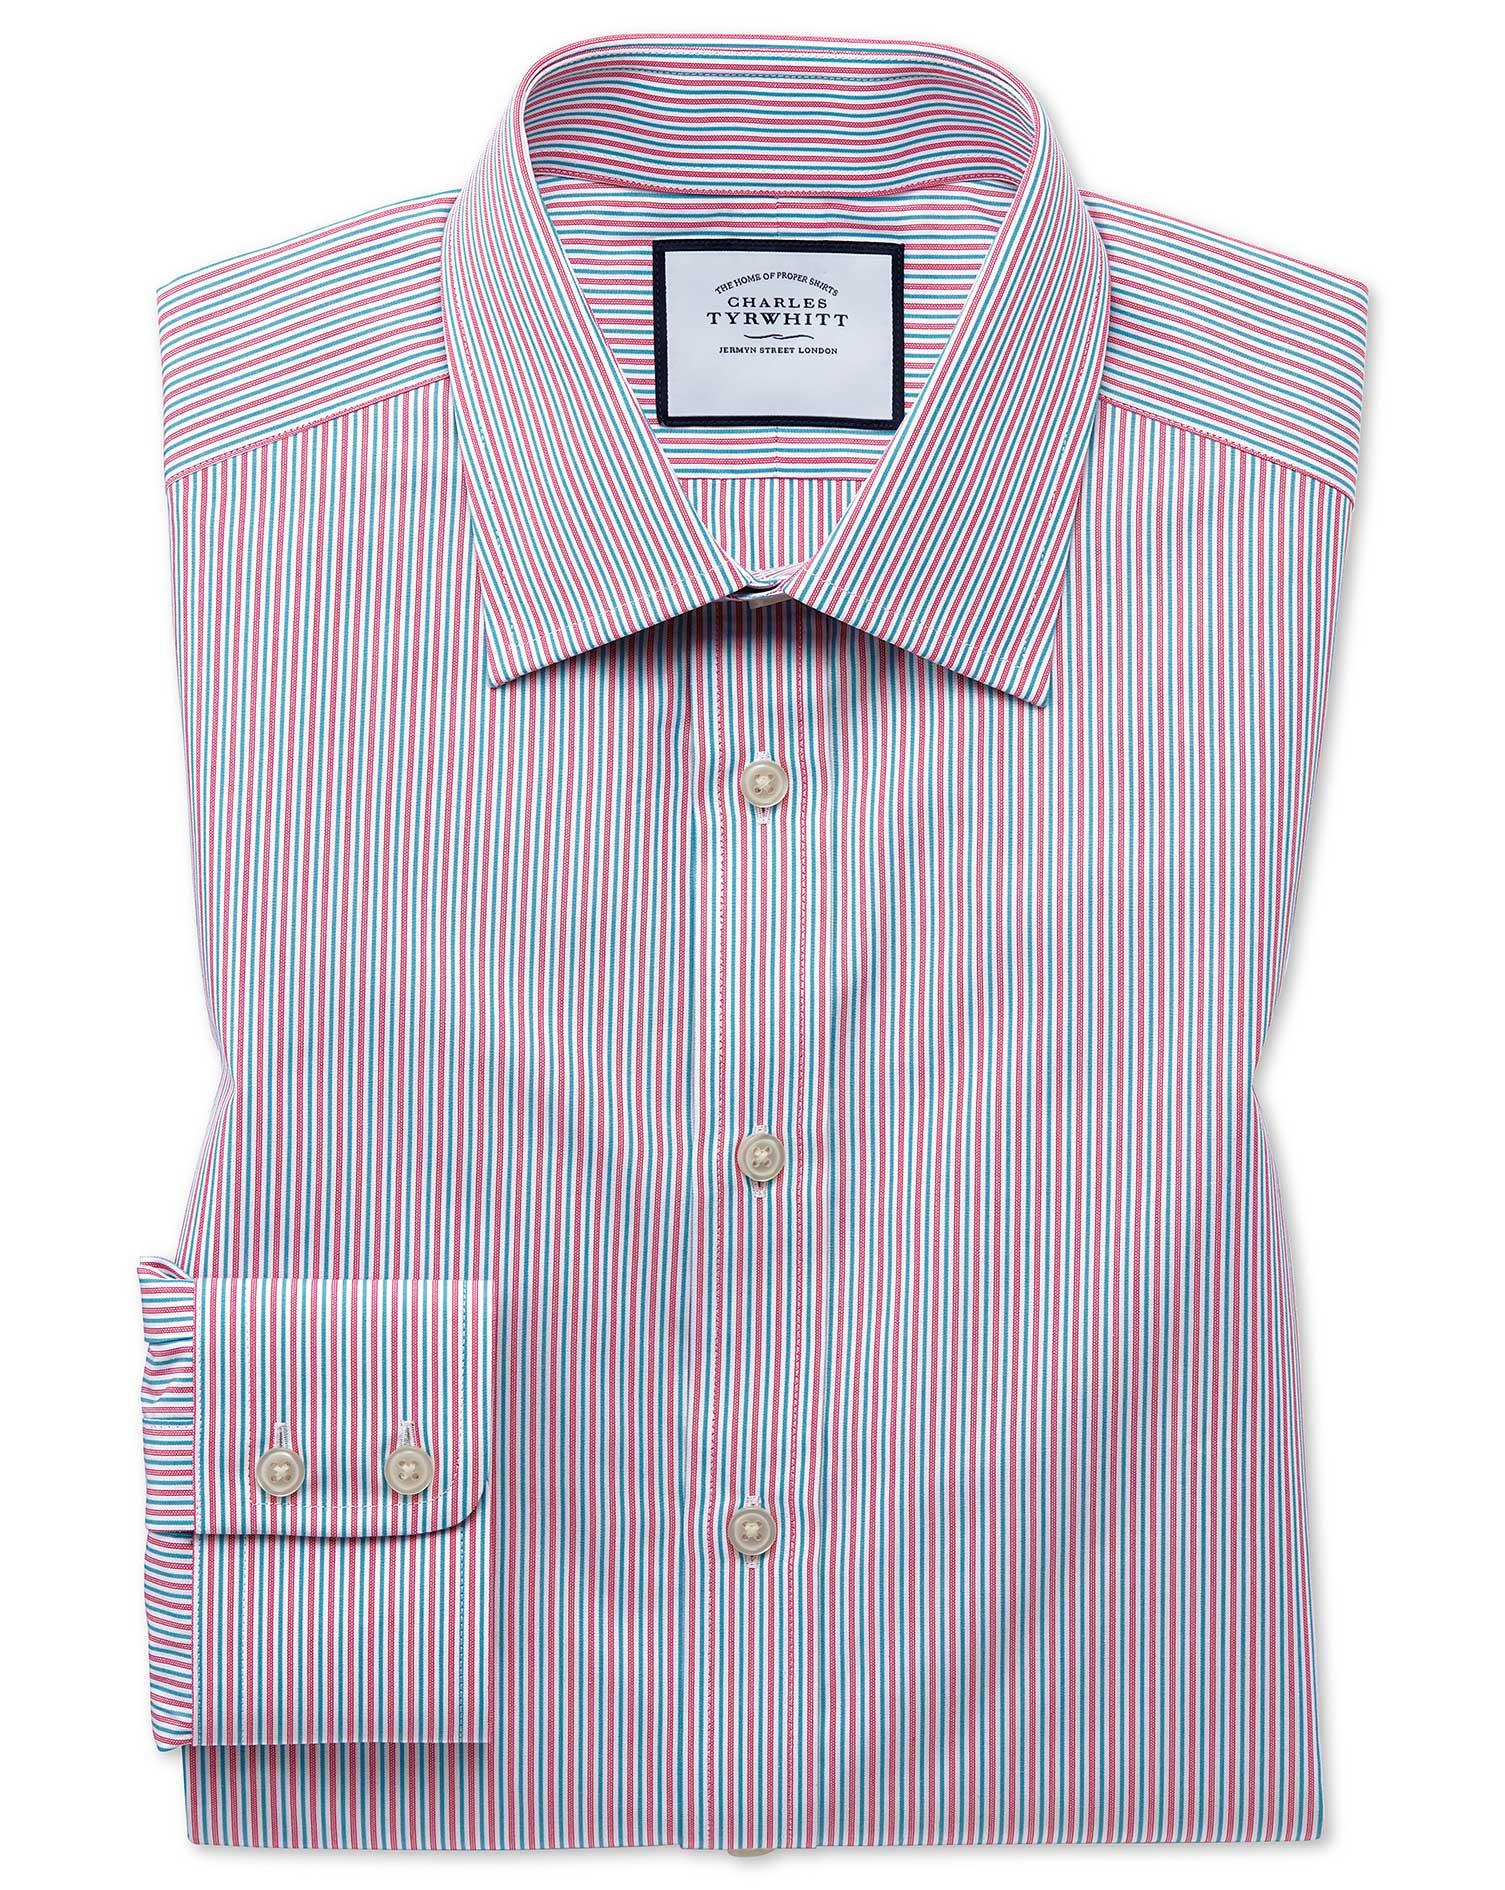 Extra Slim Fit Egyptian Cotton Poplin Multi Pink Stripe Formal Shirt Single Cuff Size 15/33 by Charl